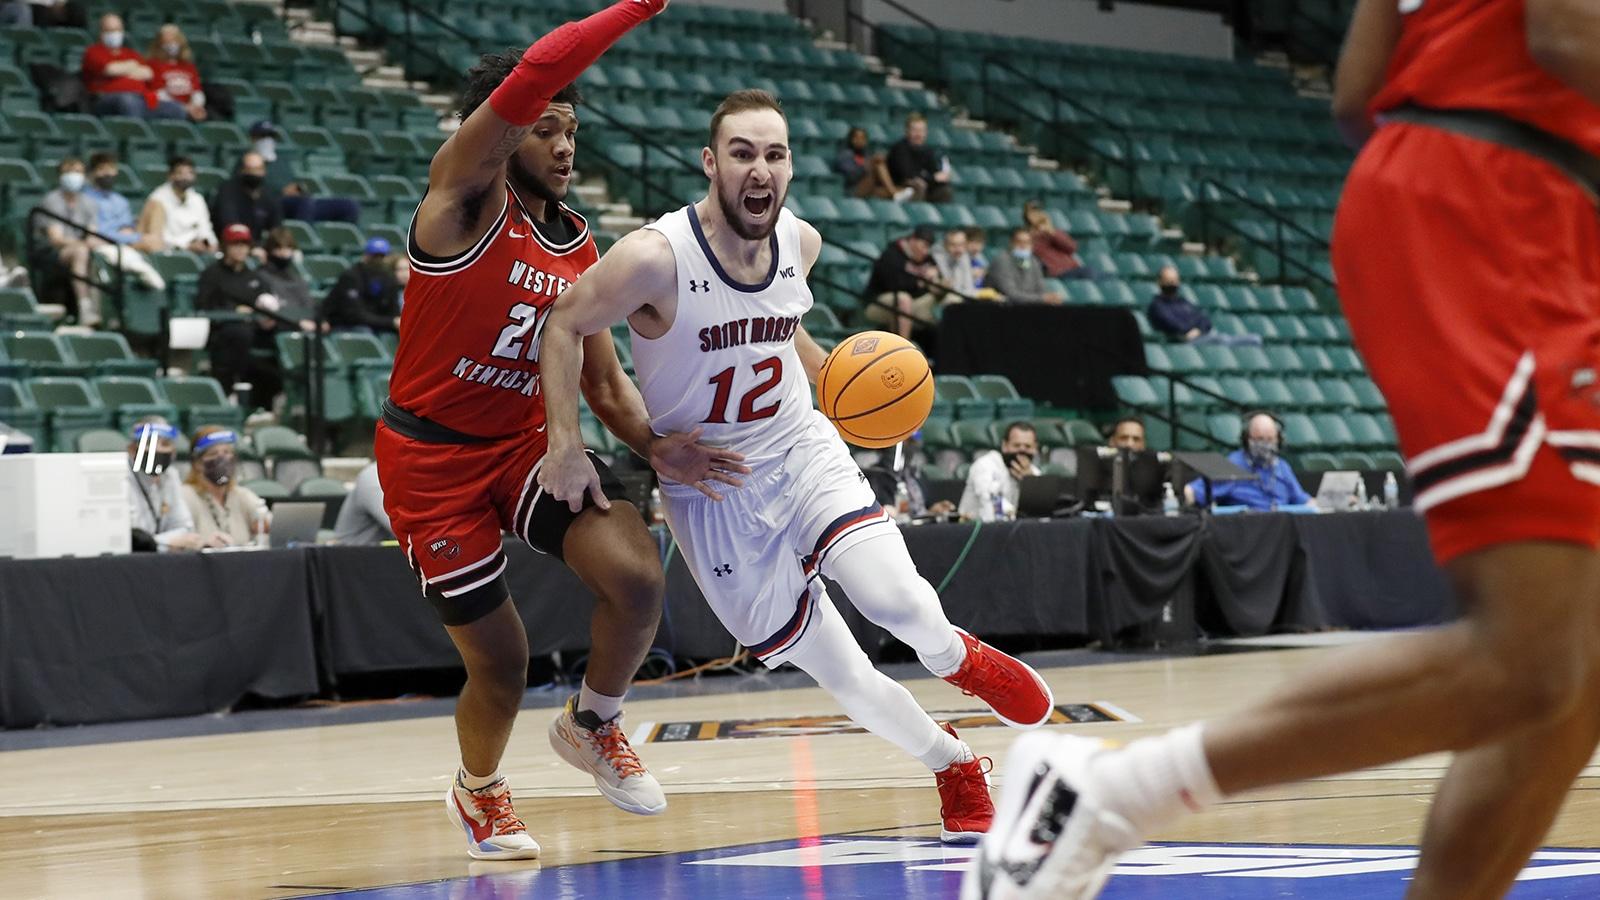 Tommy Kuhse; Saint Mary's basketball